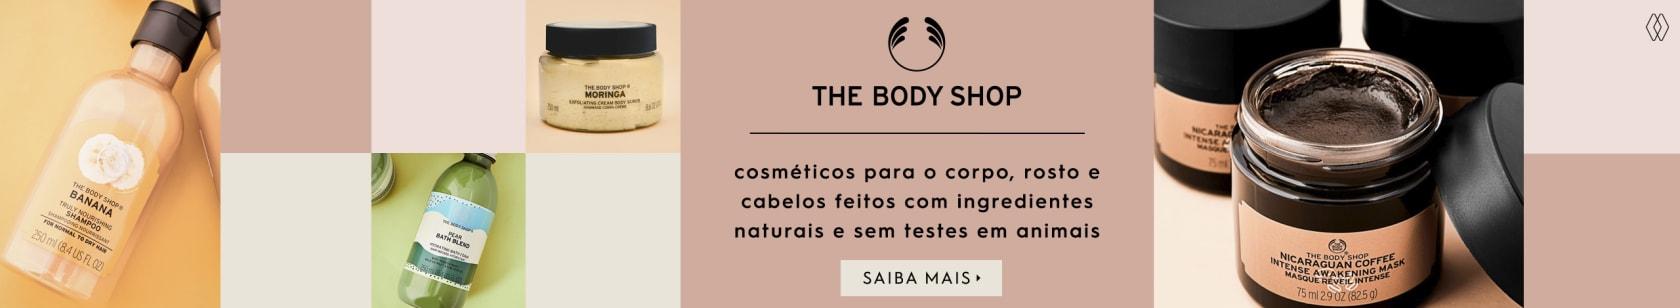 THE BODY SHOP | AMARO